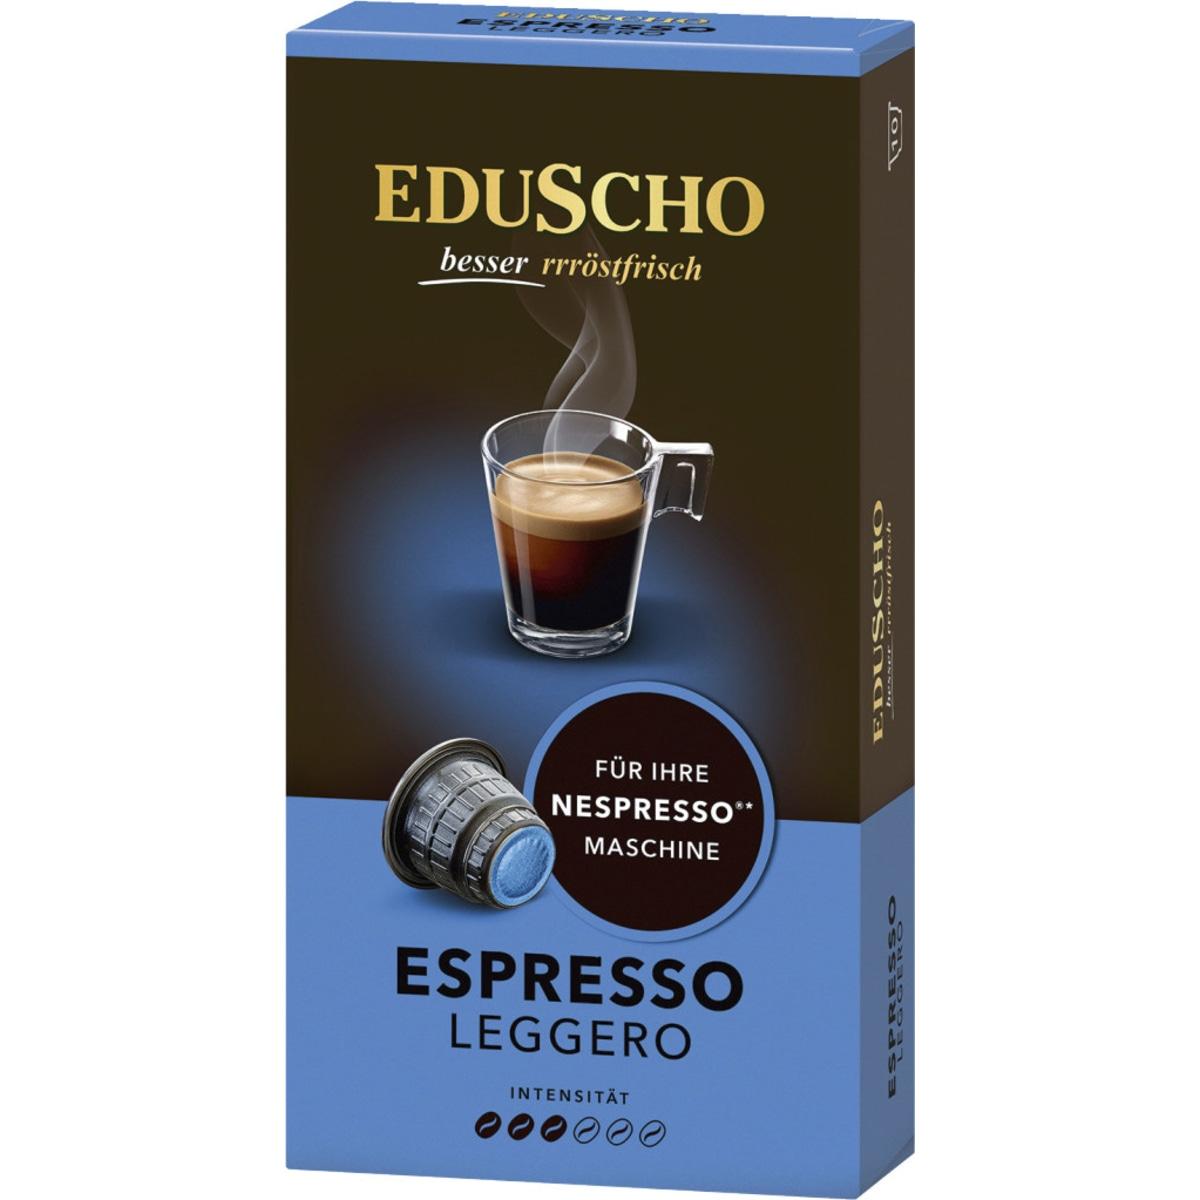 Eduscho NC Espresso Leggero Kapseln